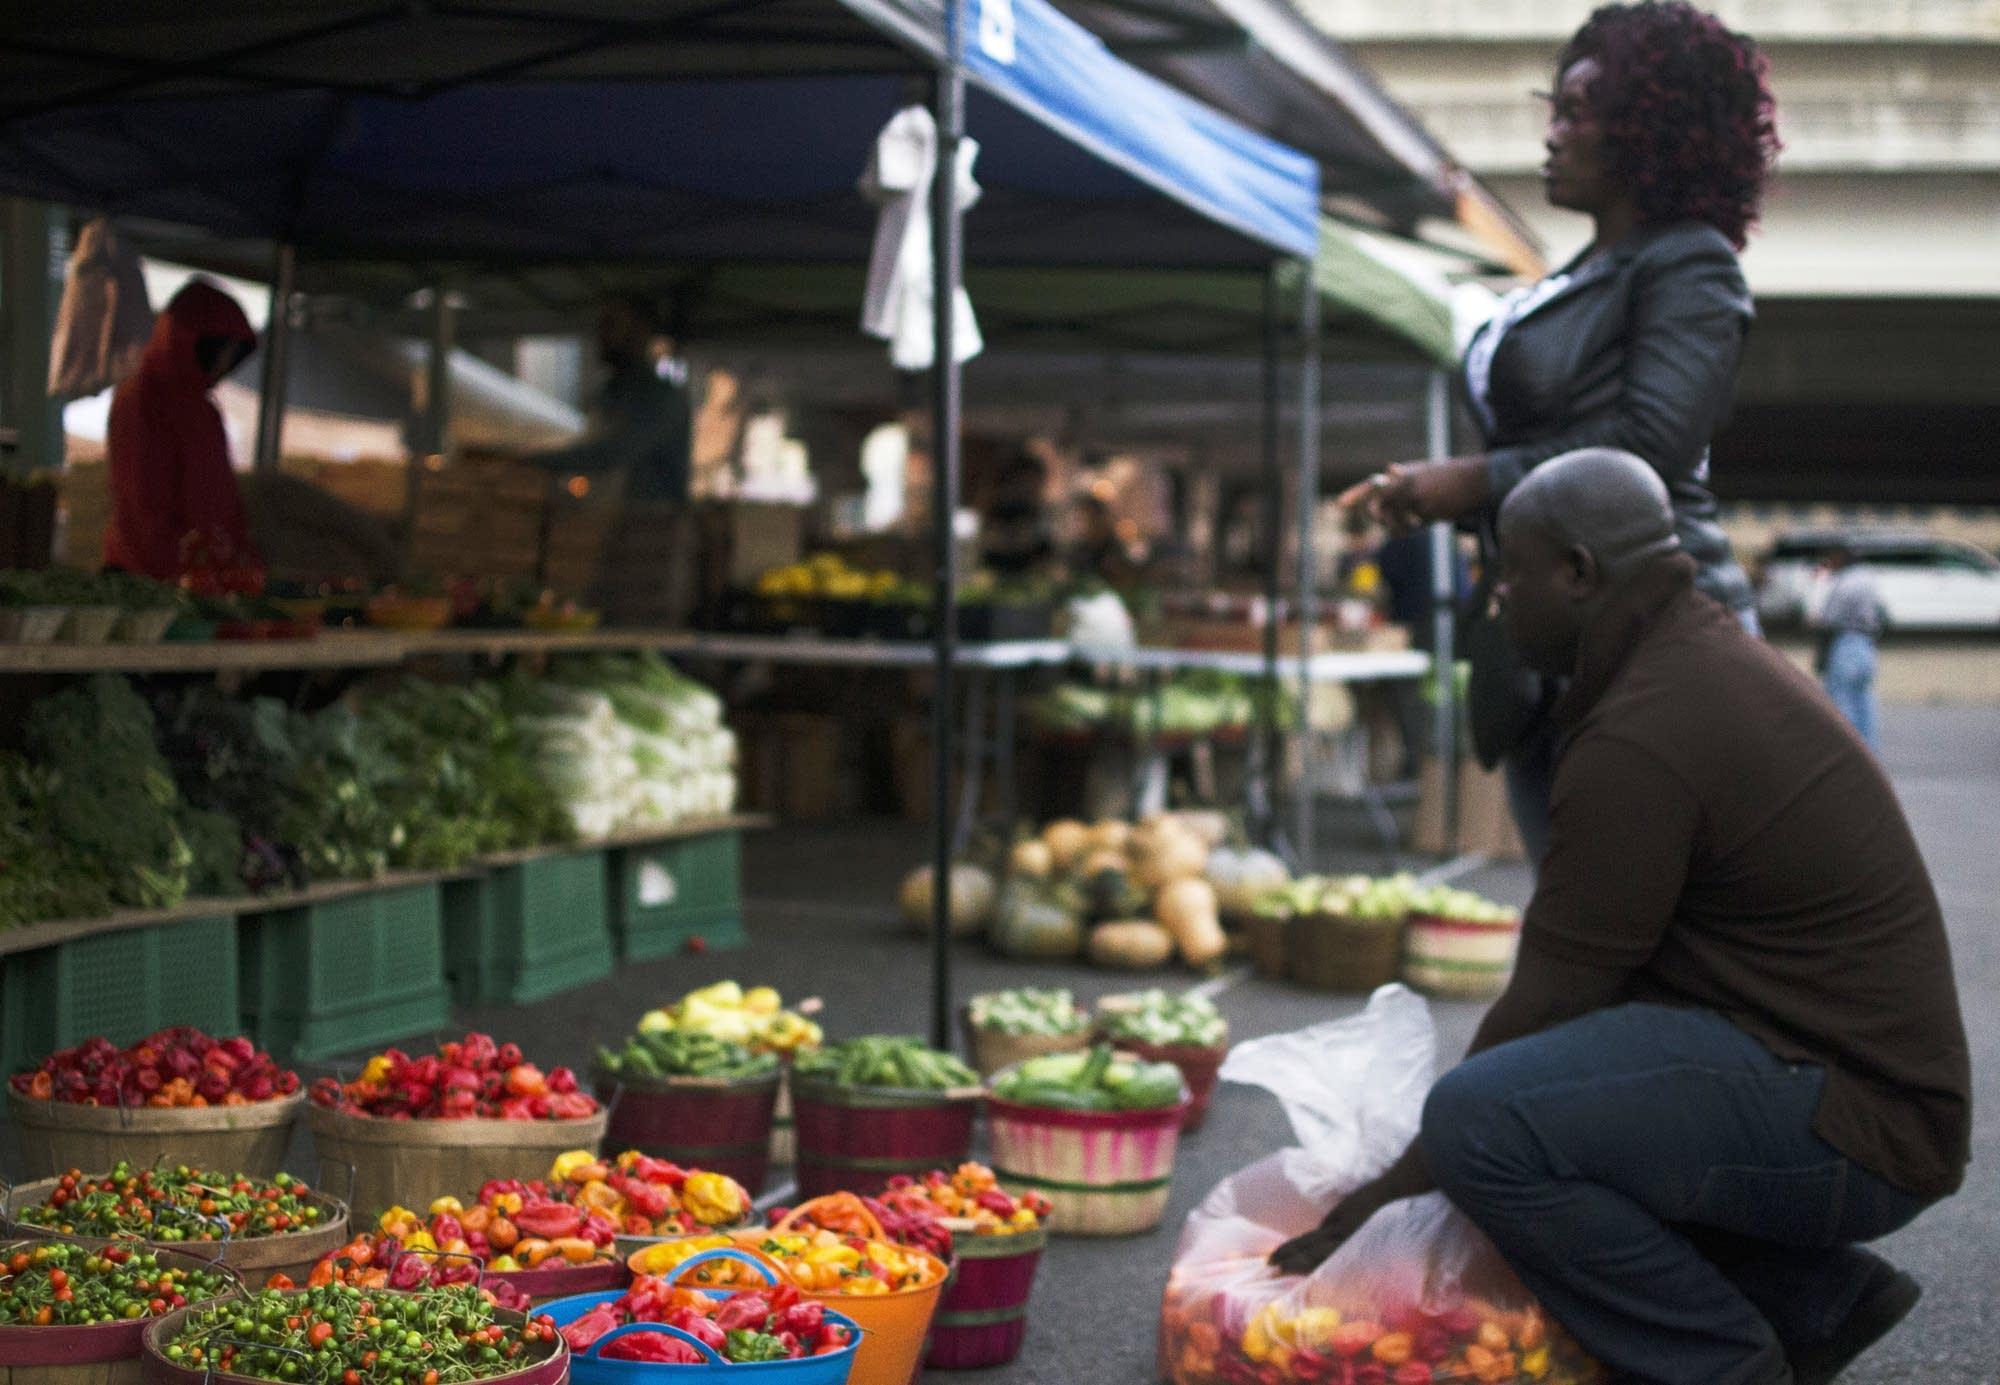 9850c5-20160920-minneapolis-farmers-market9.jpg